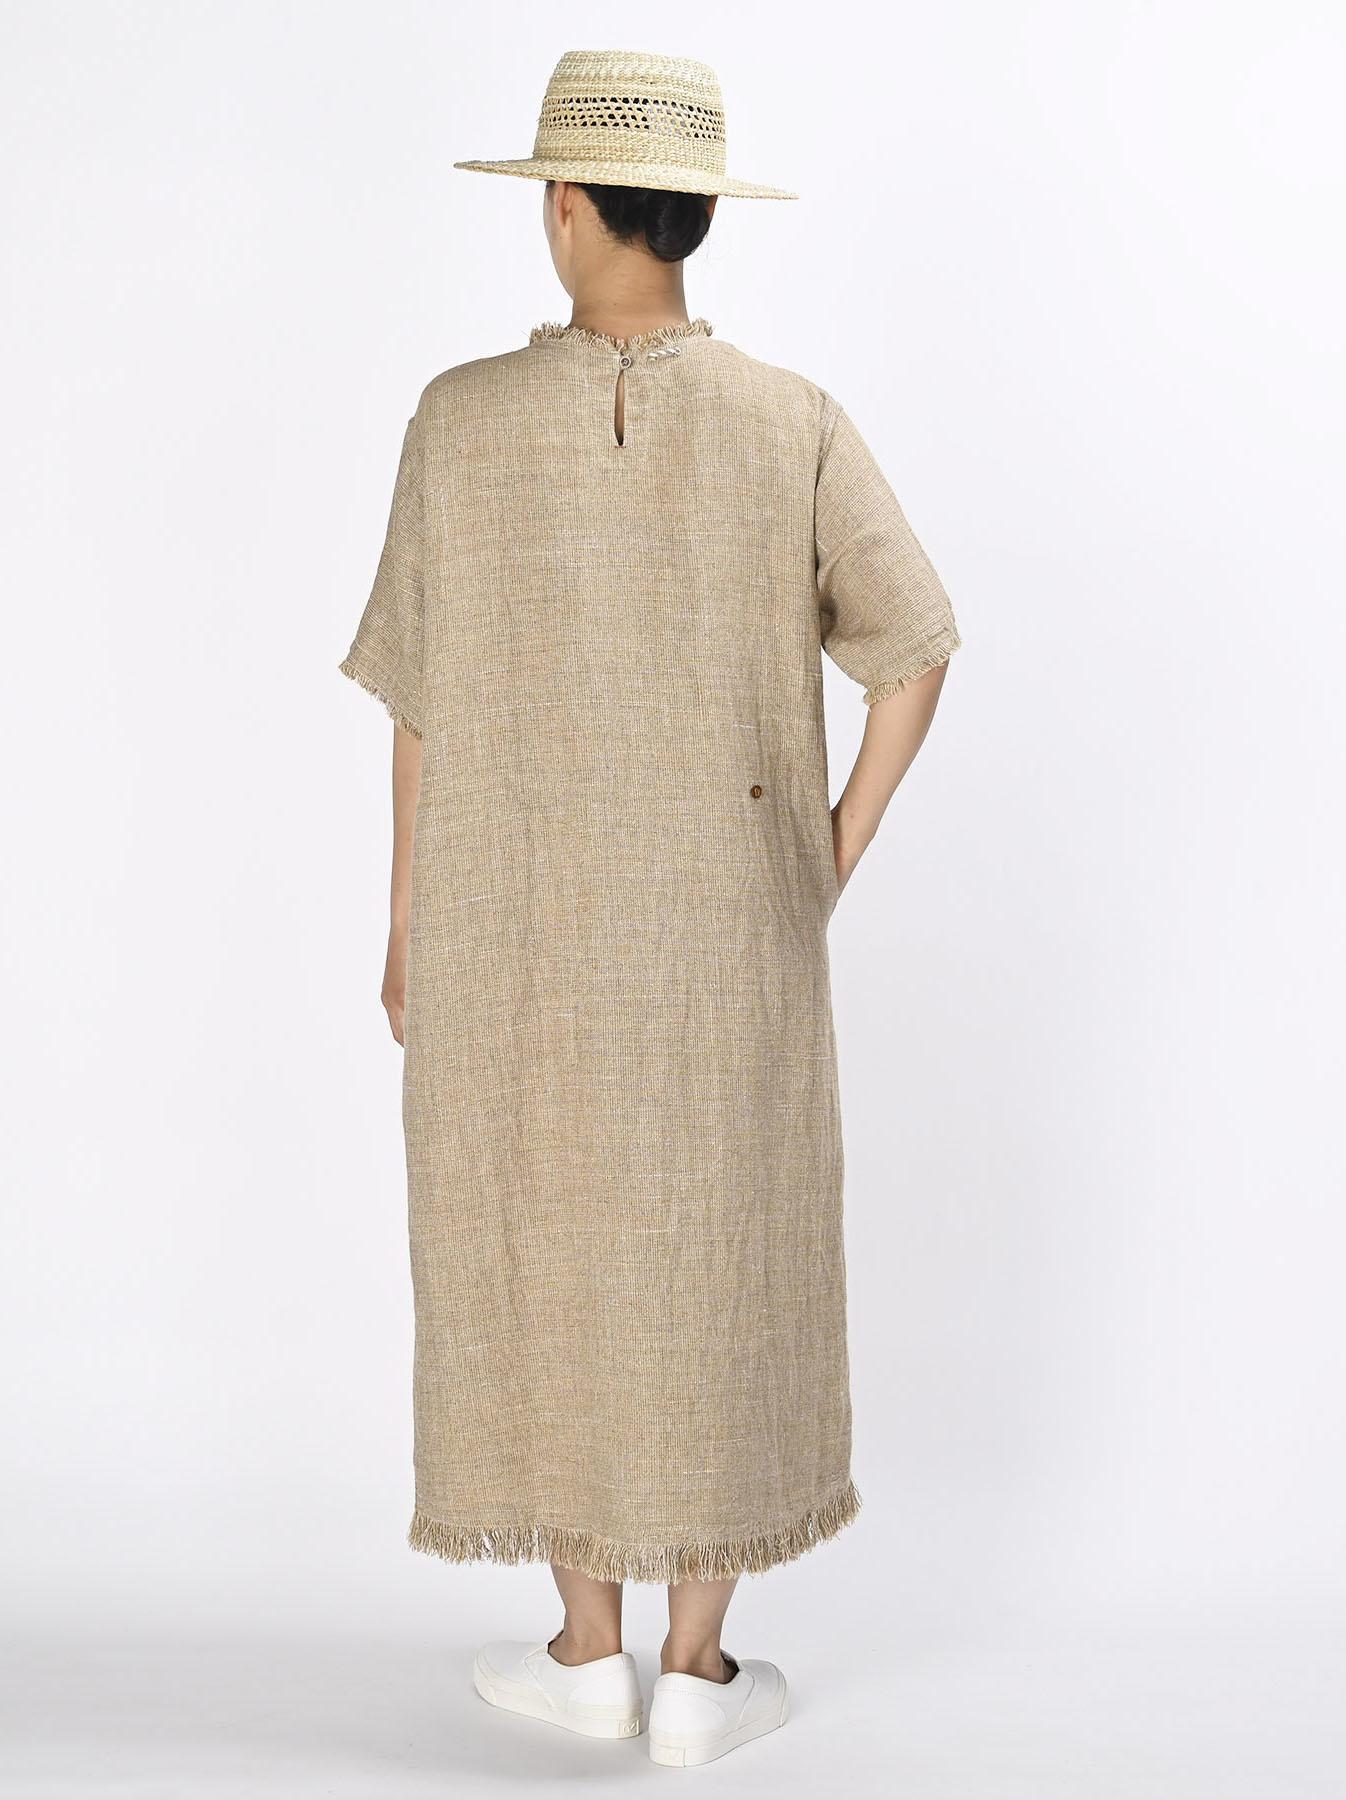 Gima Tweed Leilei Embroidery Dress-4